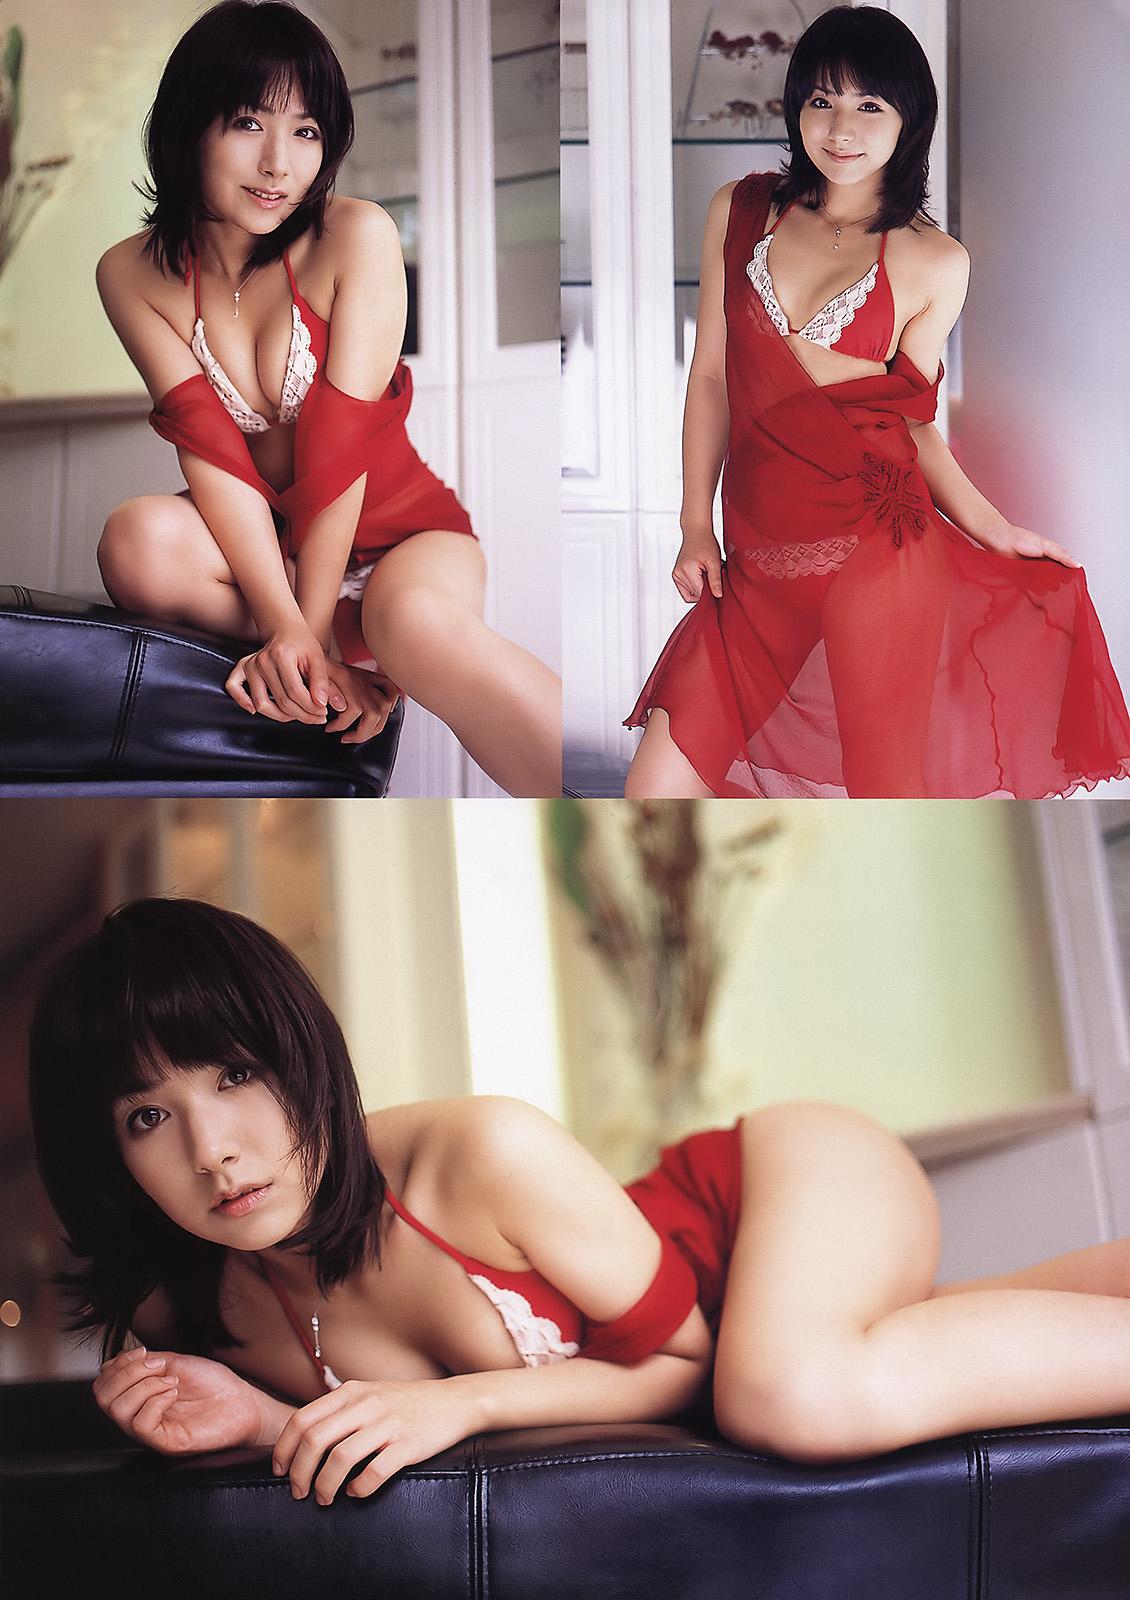 Atsumi Ishihara